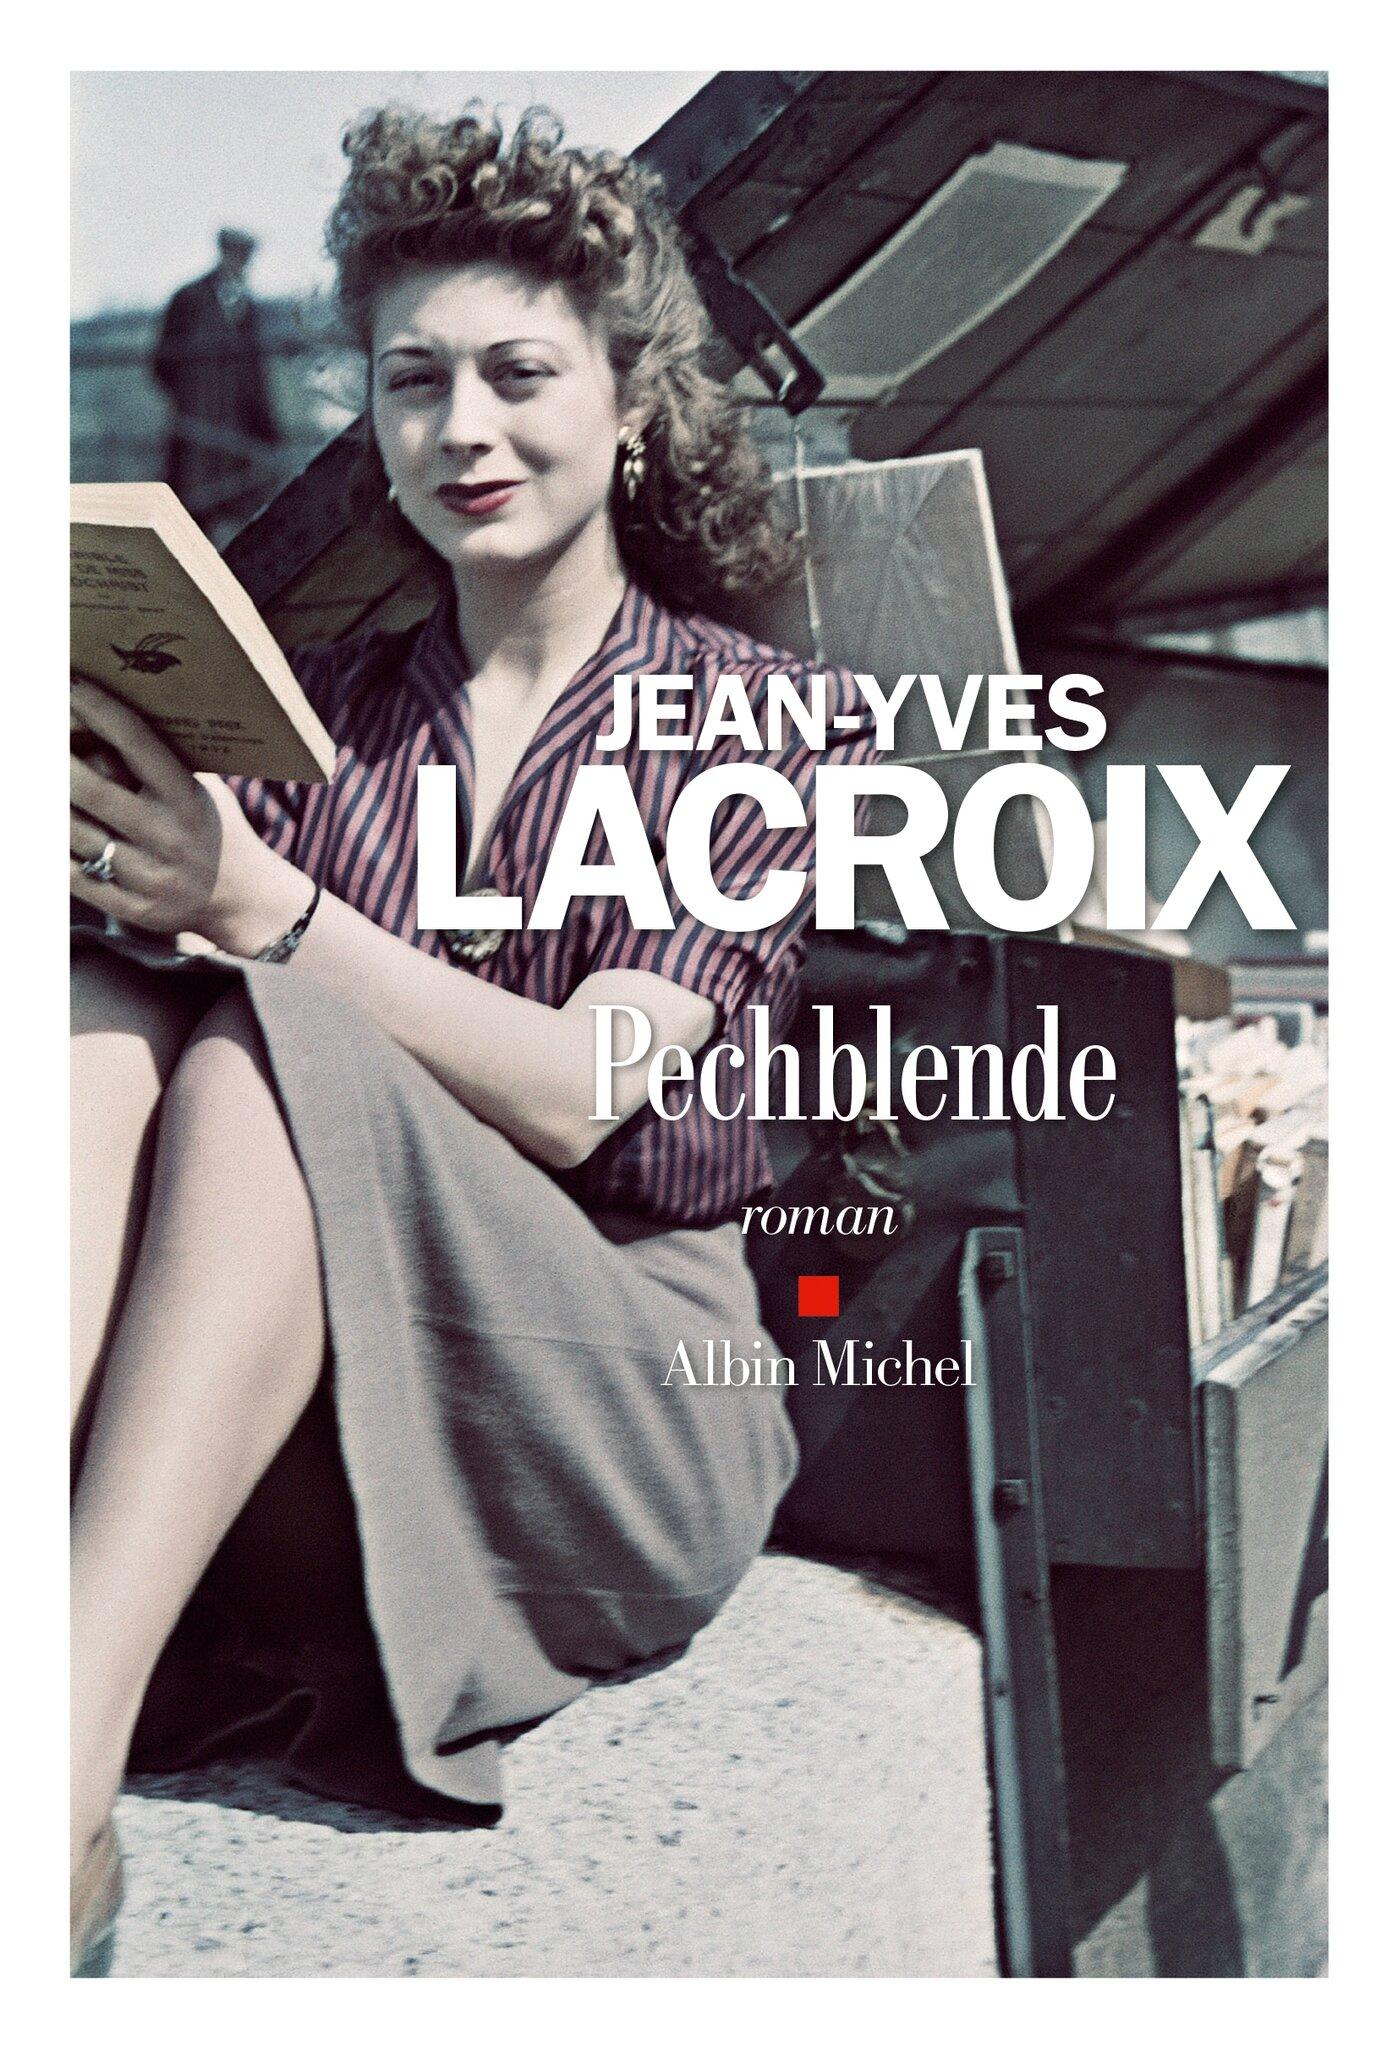 Pechblende, Jean-Yves Lacroix